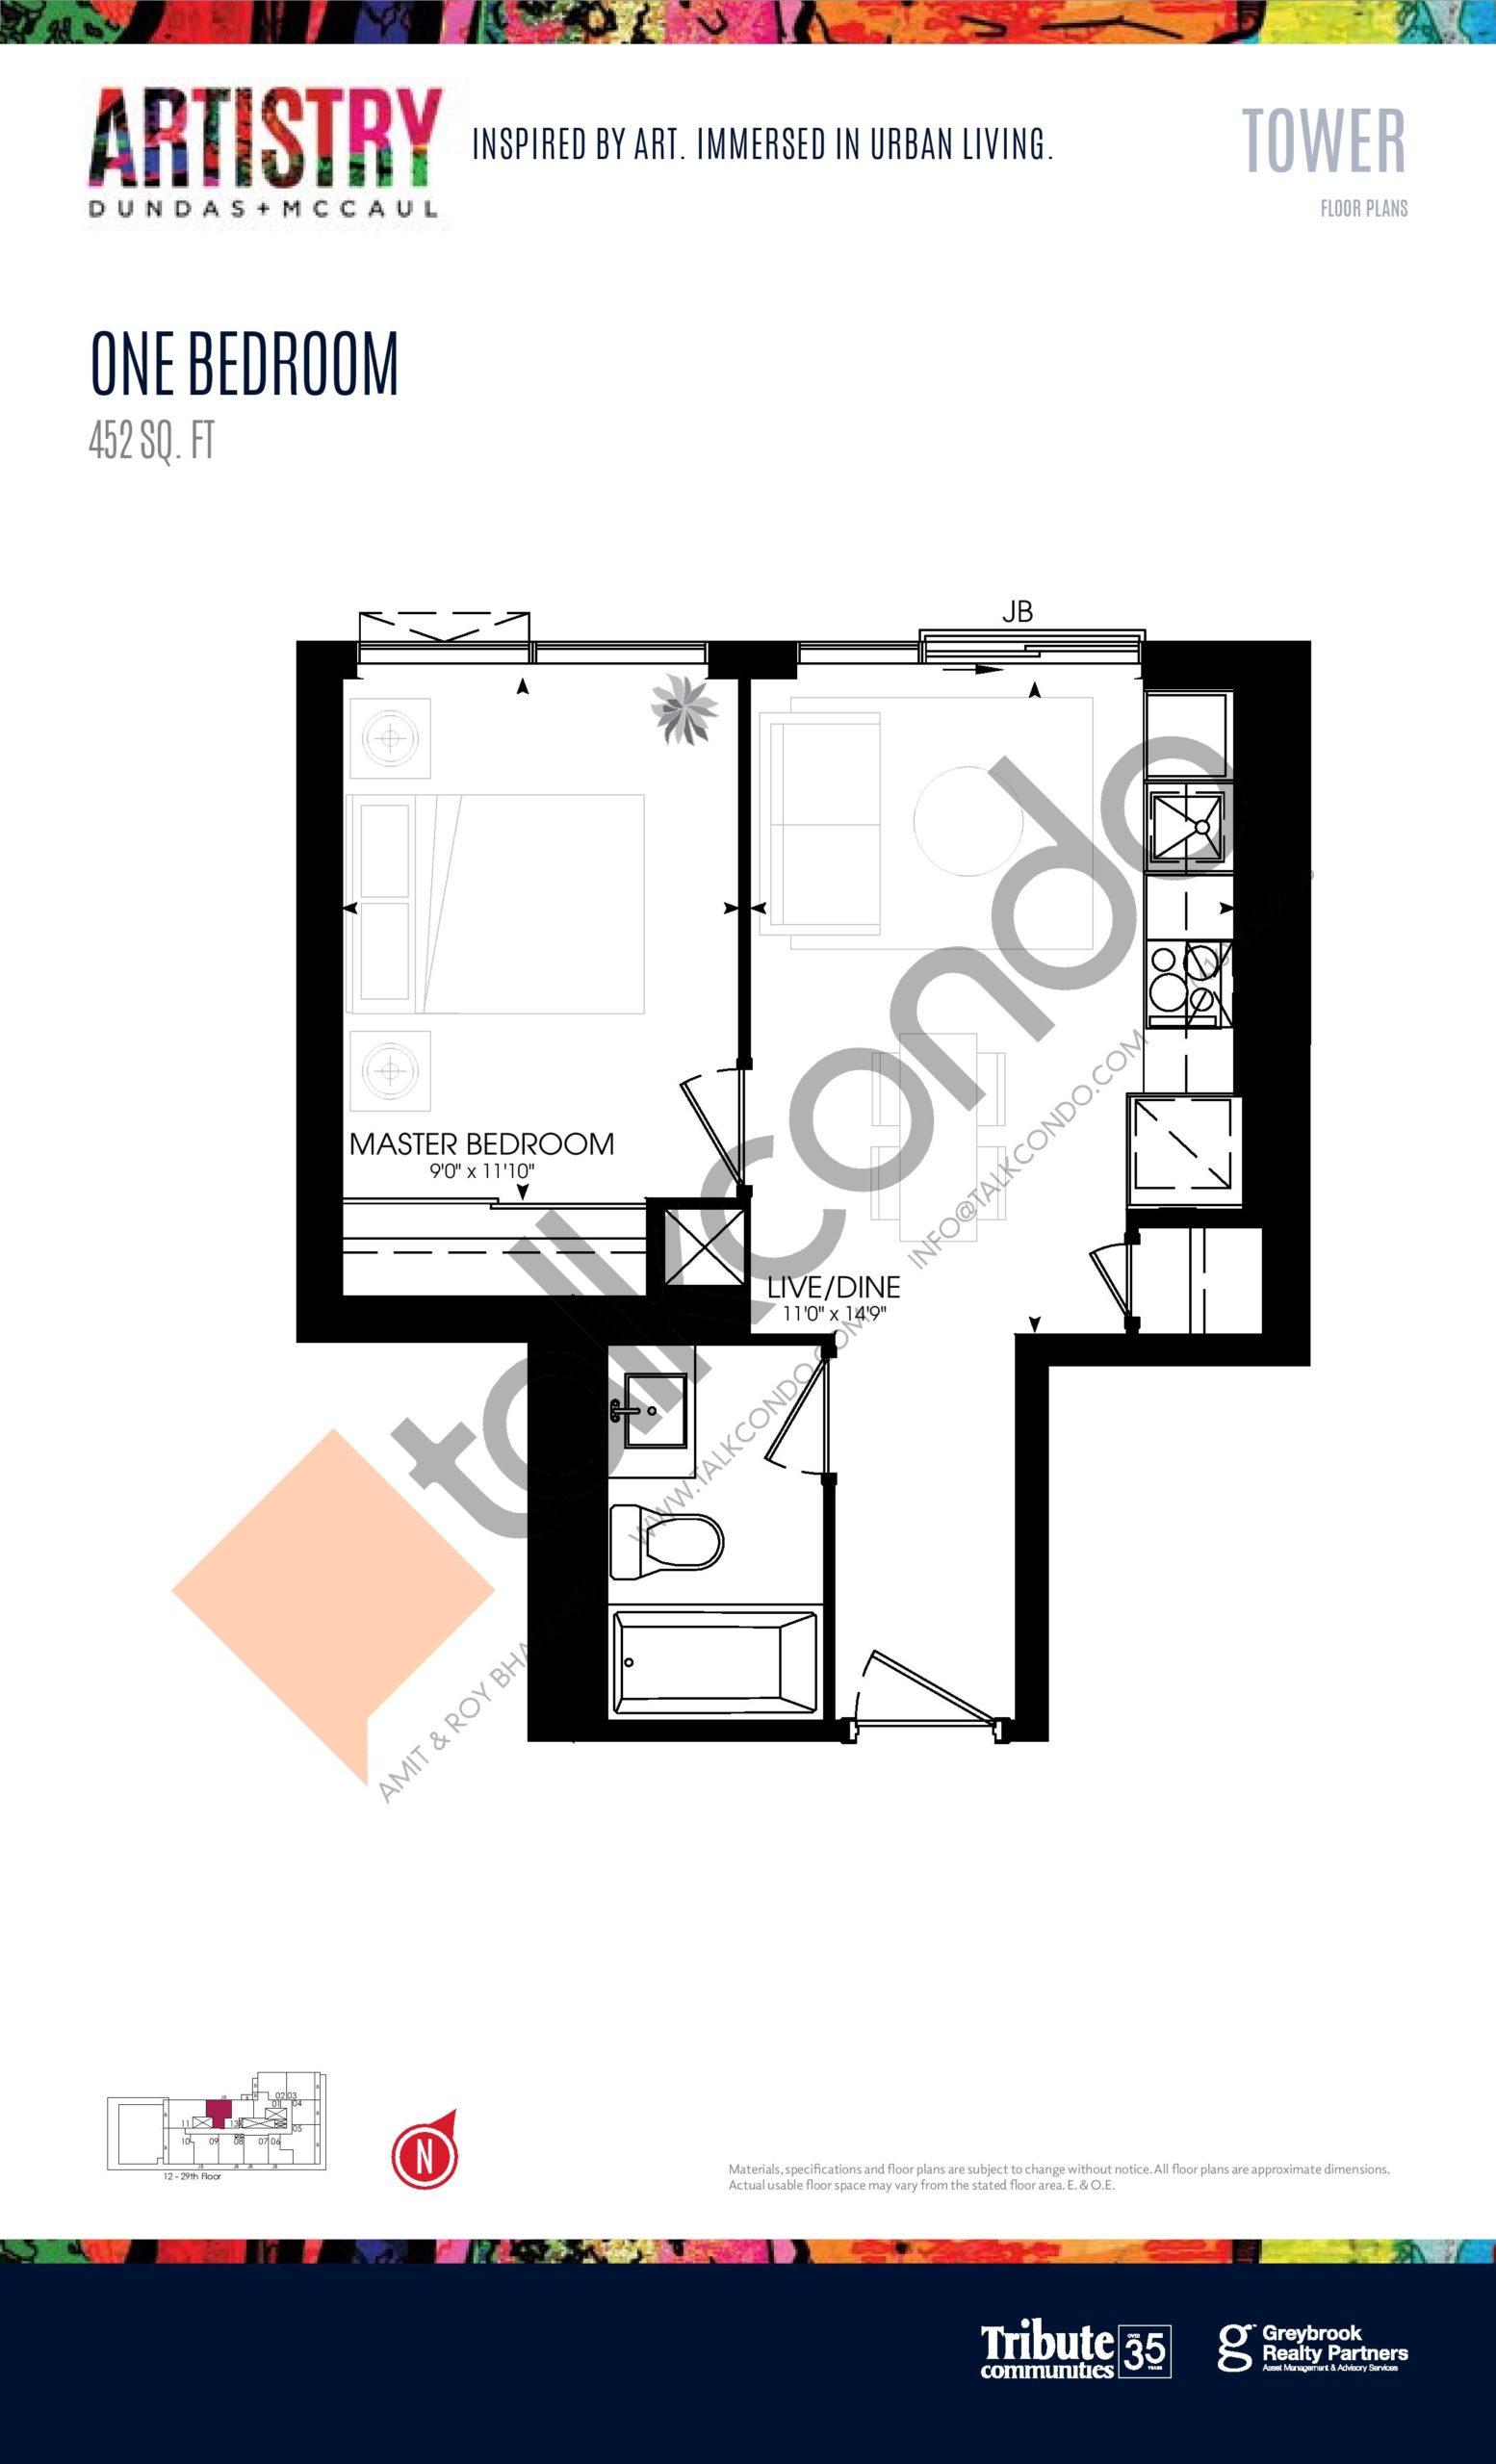 452 sq. ft. - Tower Floor Plan at Artistry Condos - 452 sq.ft